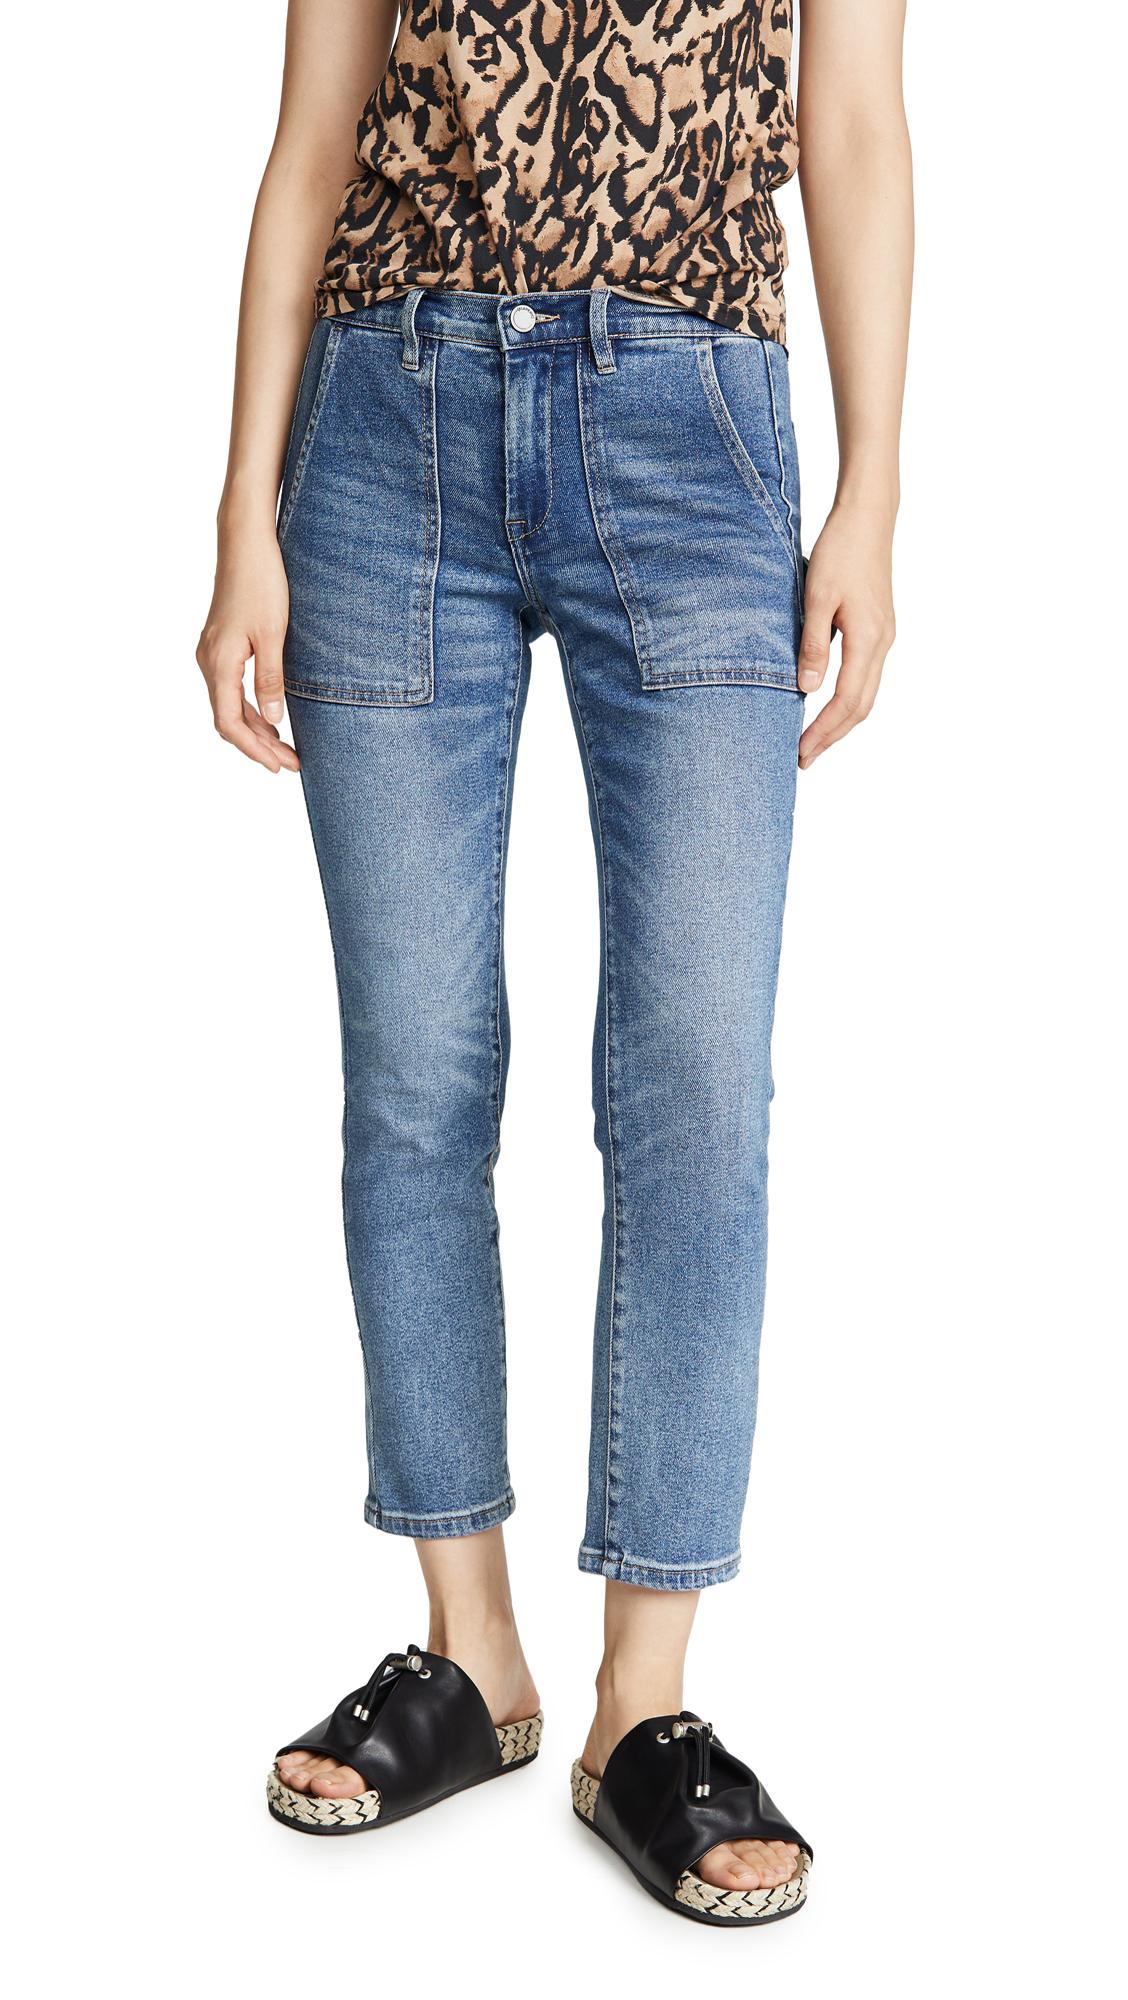 Blank Denim Thank U Next Jeans In Thank U, Next